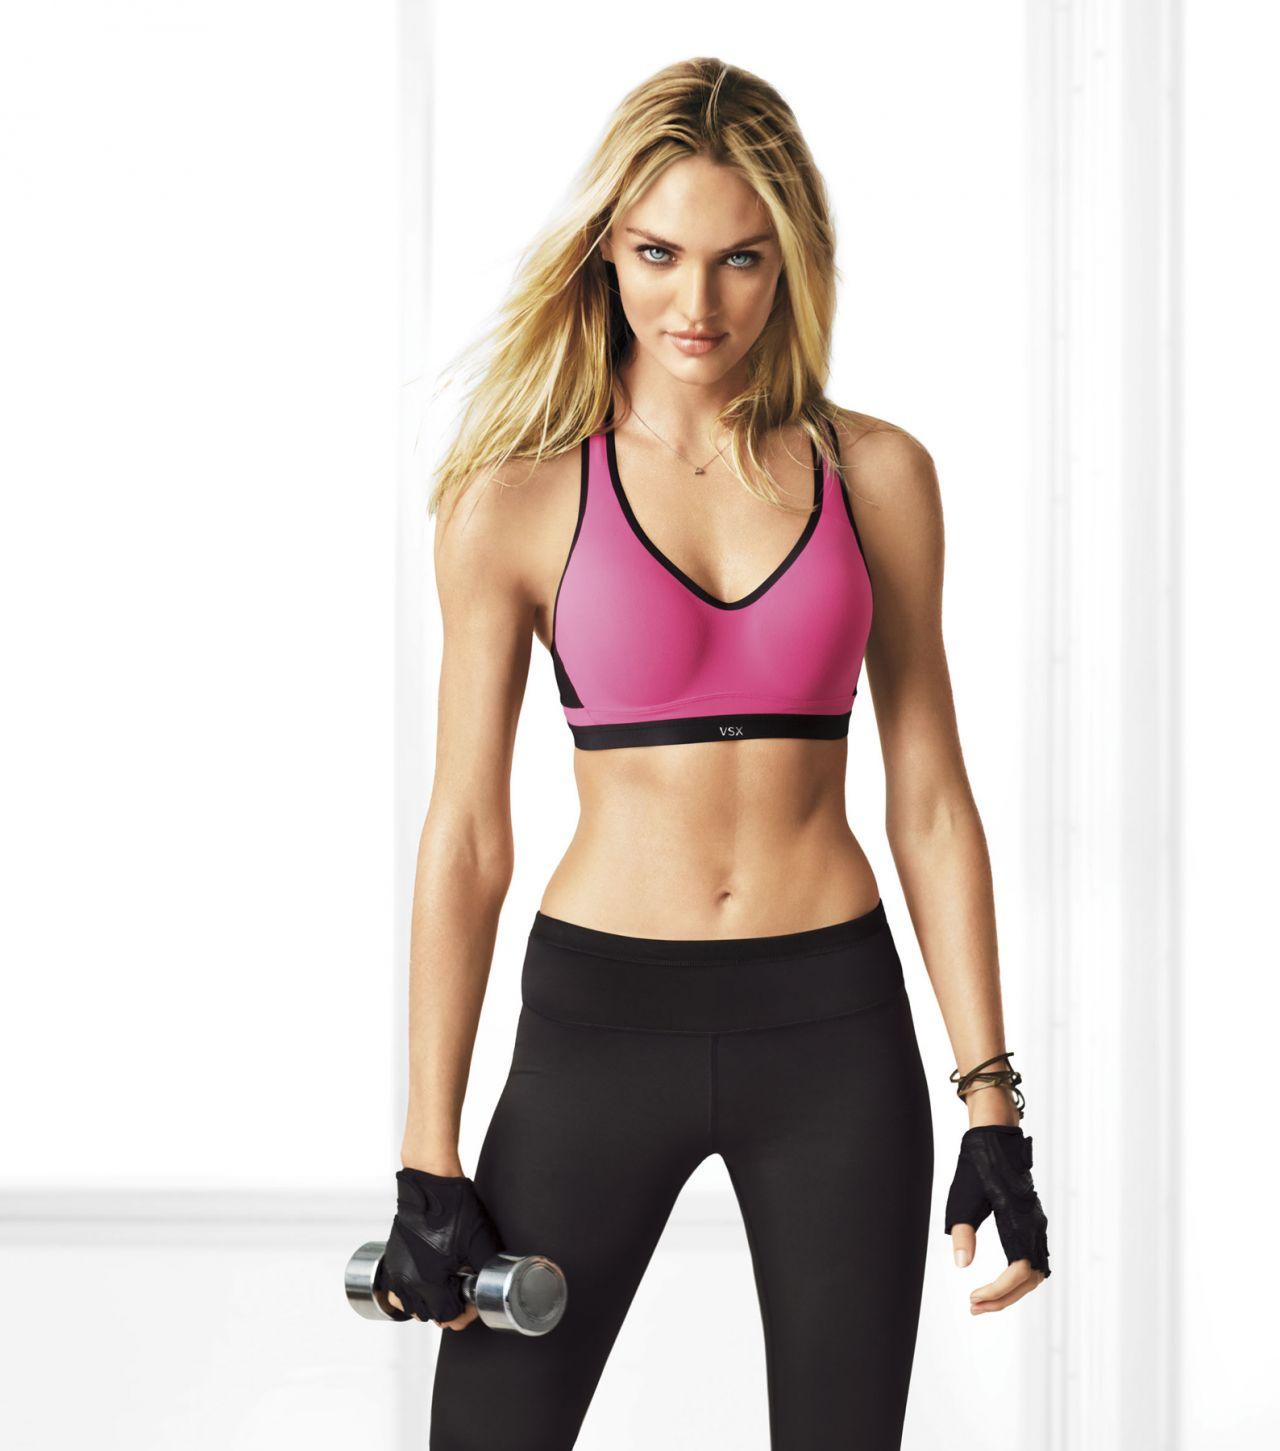 Candice Swanepoel Photoshoot -2013 VSX Sport